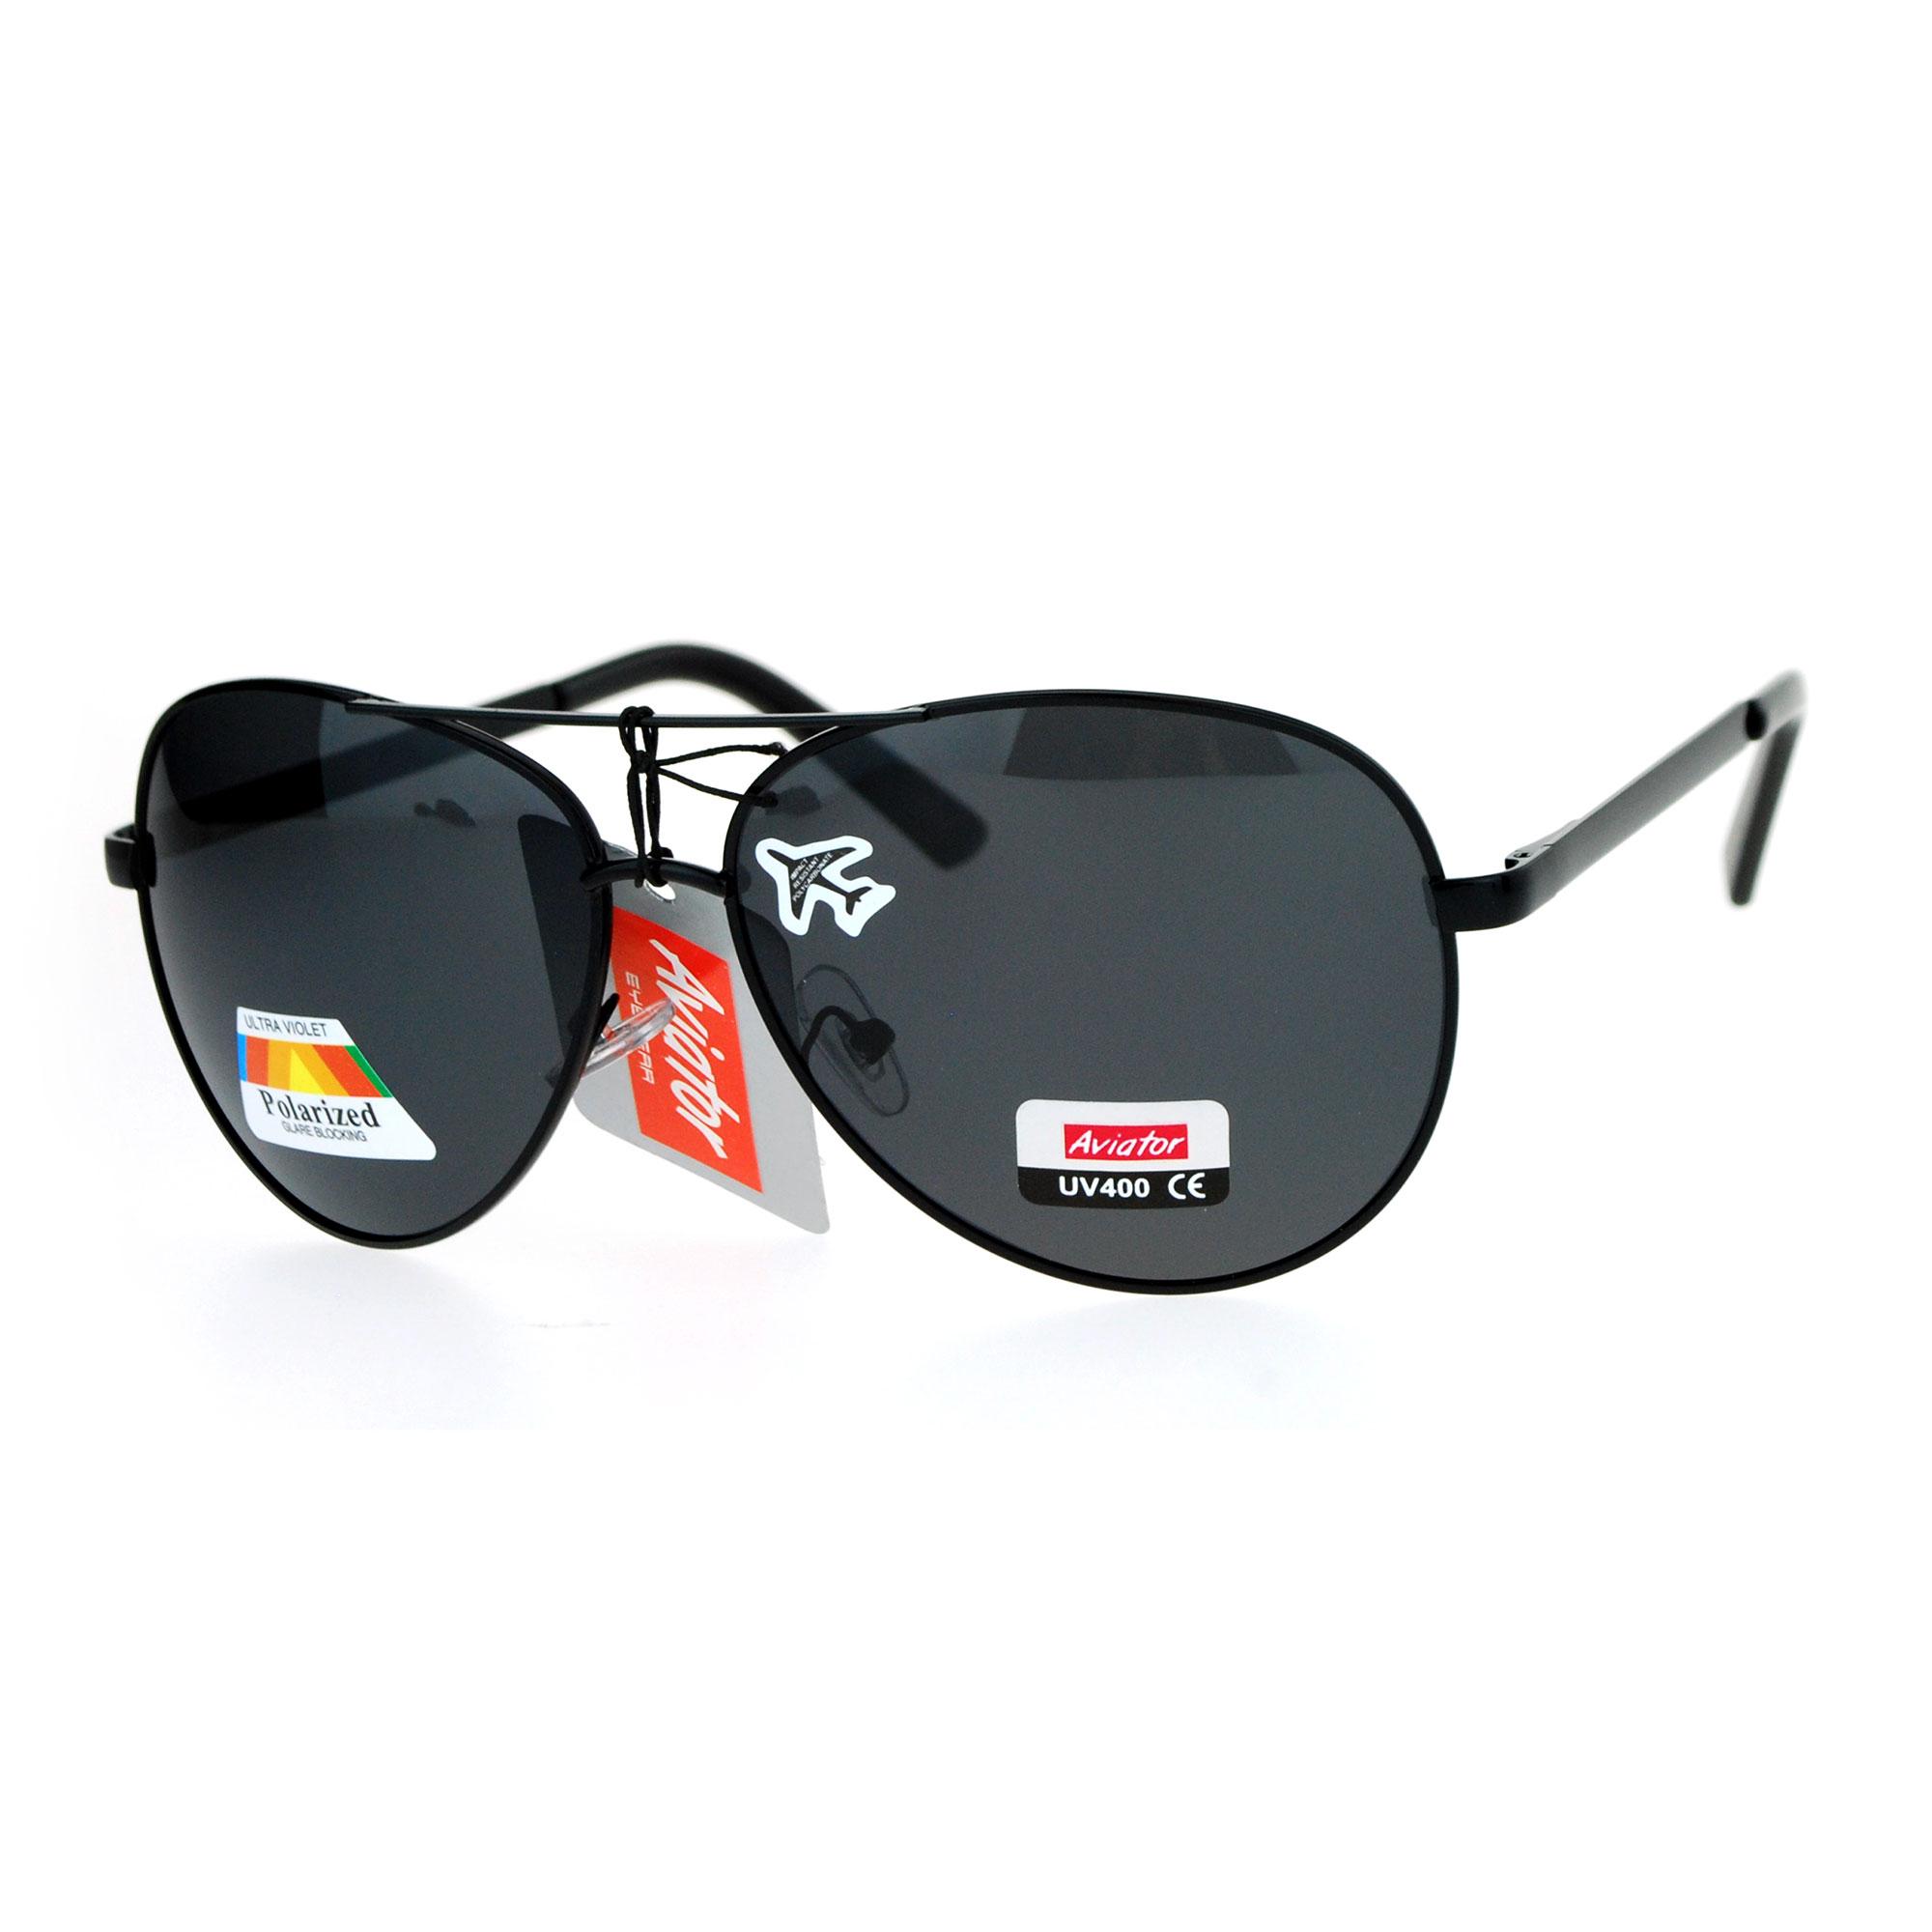 26f440a77f SA106 Antiglare Polarized Lens Large Aviator Biker Police Sunglasses ...